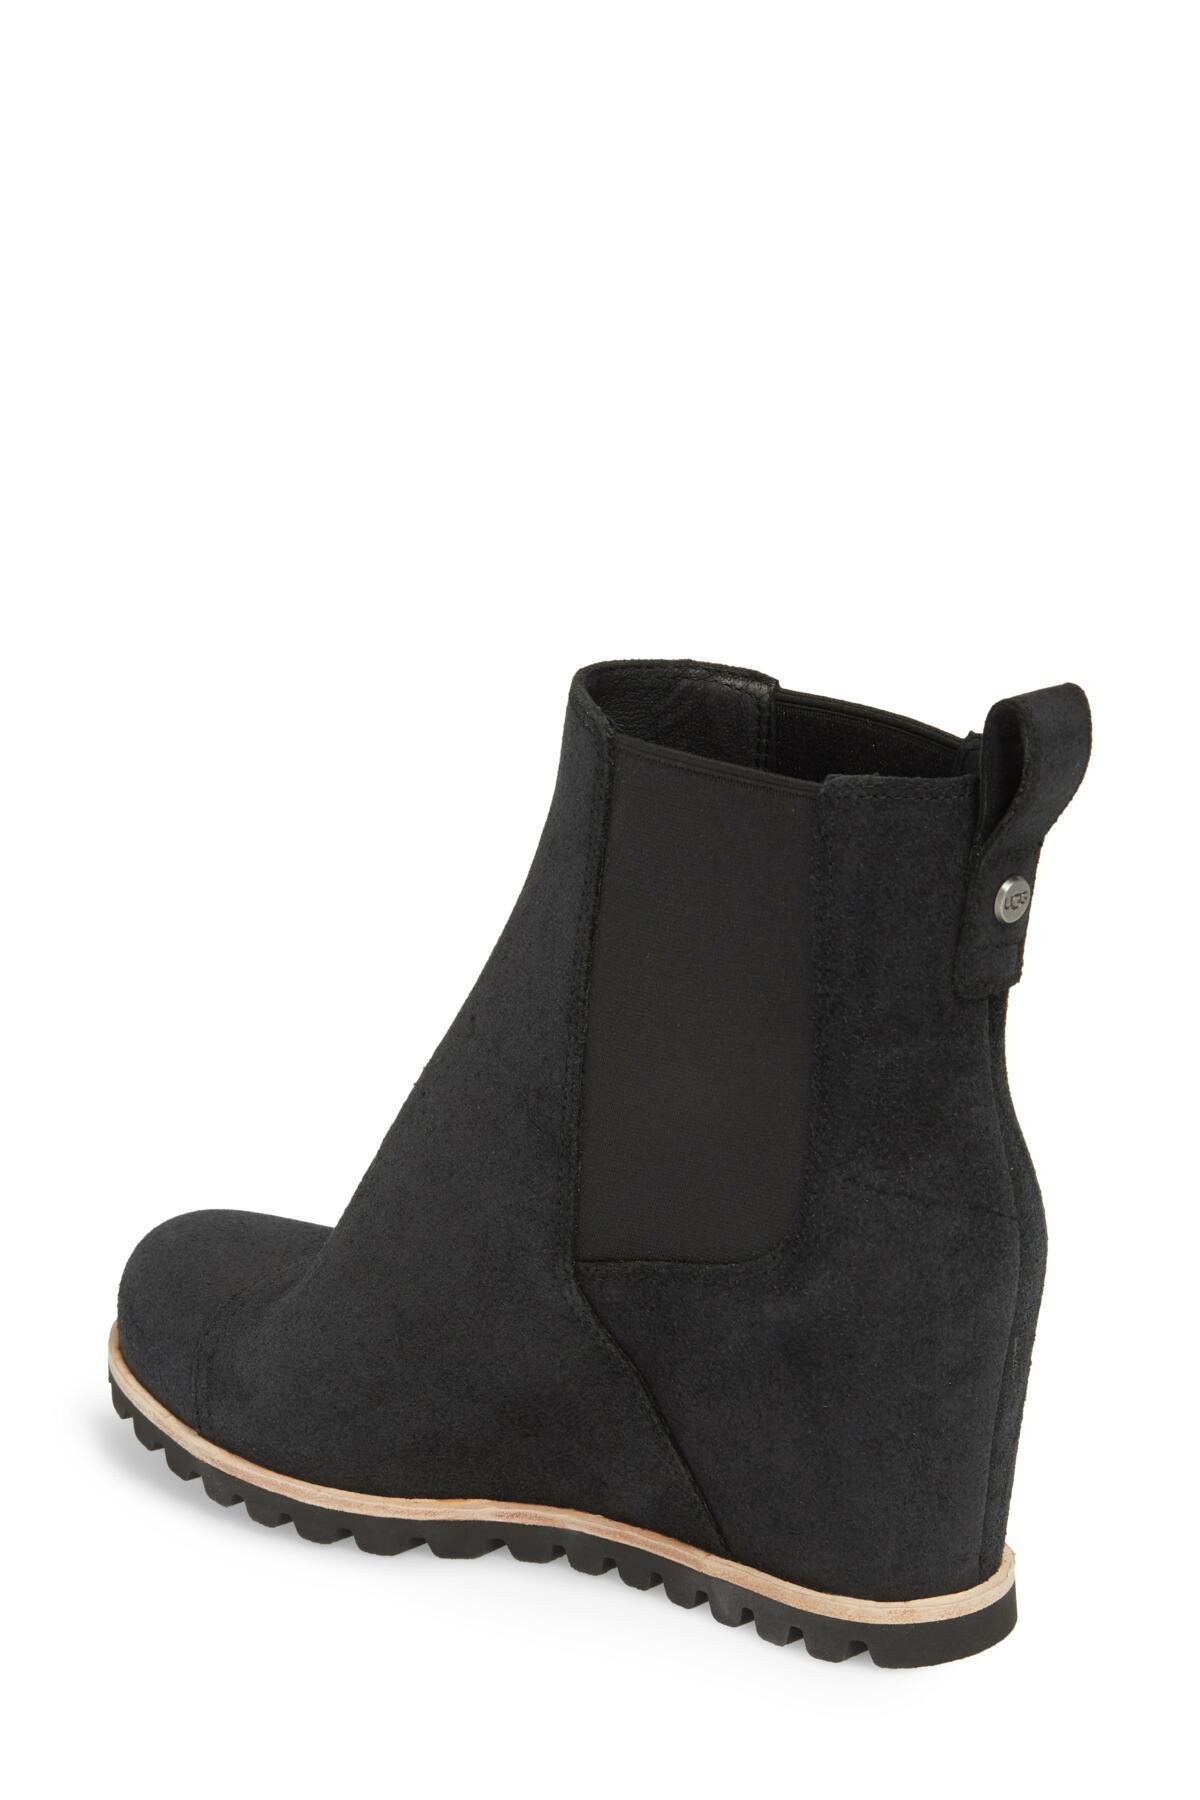 36c8373e46ec Ugg - Black (r) Pax Waterproof Wedge Boot (women) - Lyst. View fullscreen